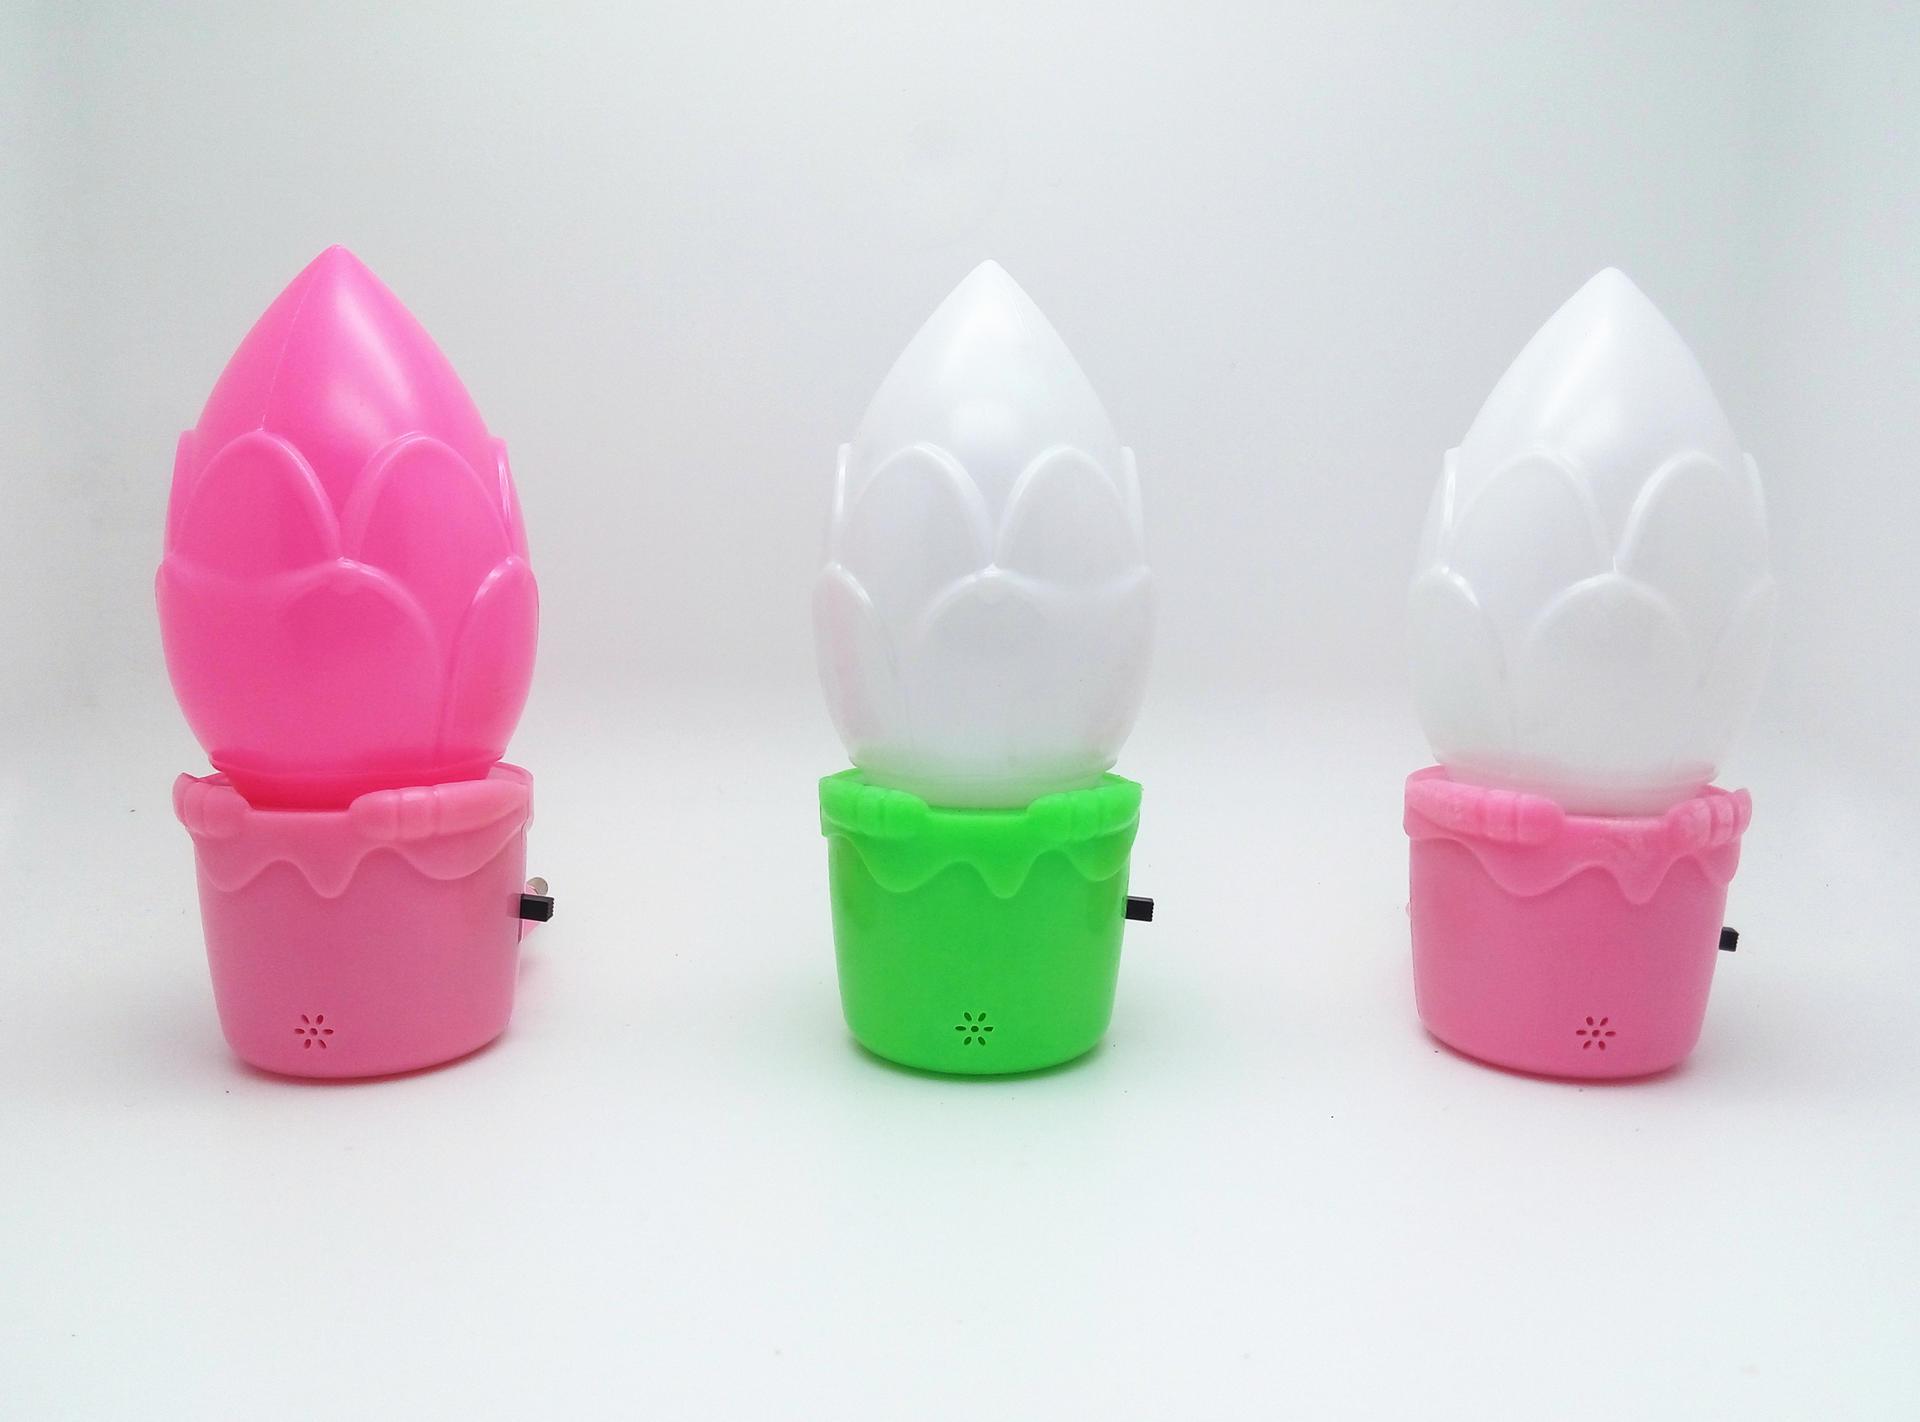 W013 Flower shape LED night light mini switch plug in for kids baby bedroom